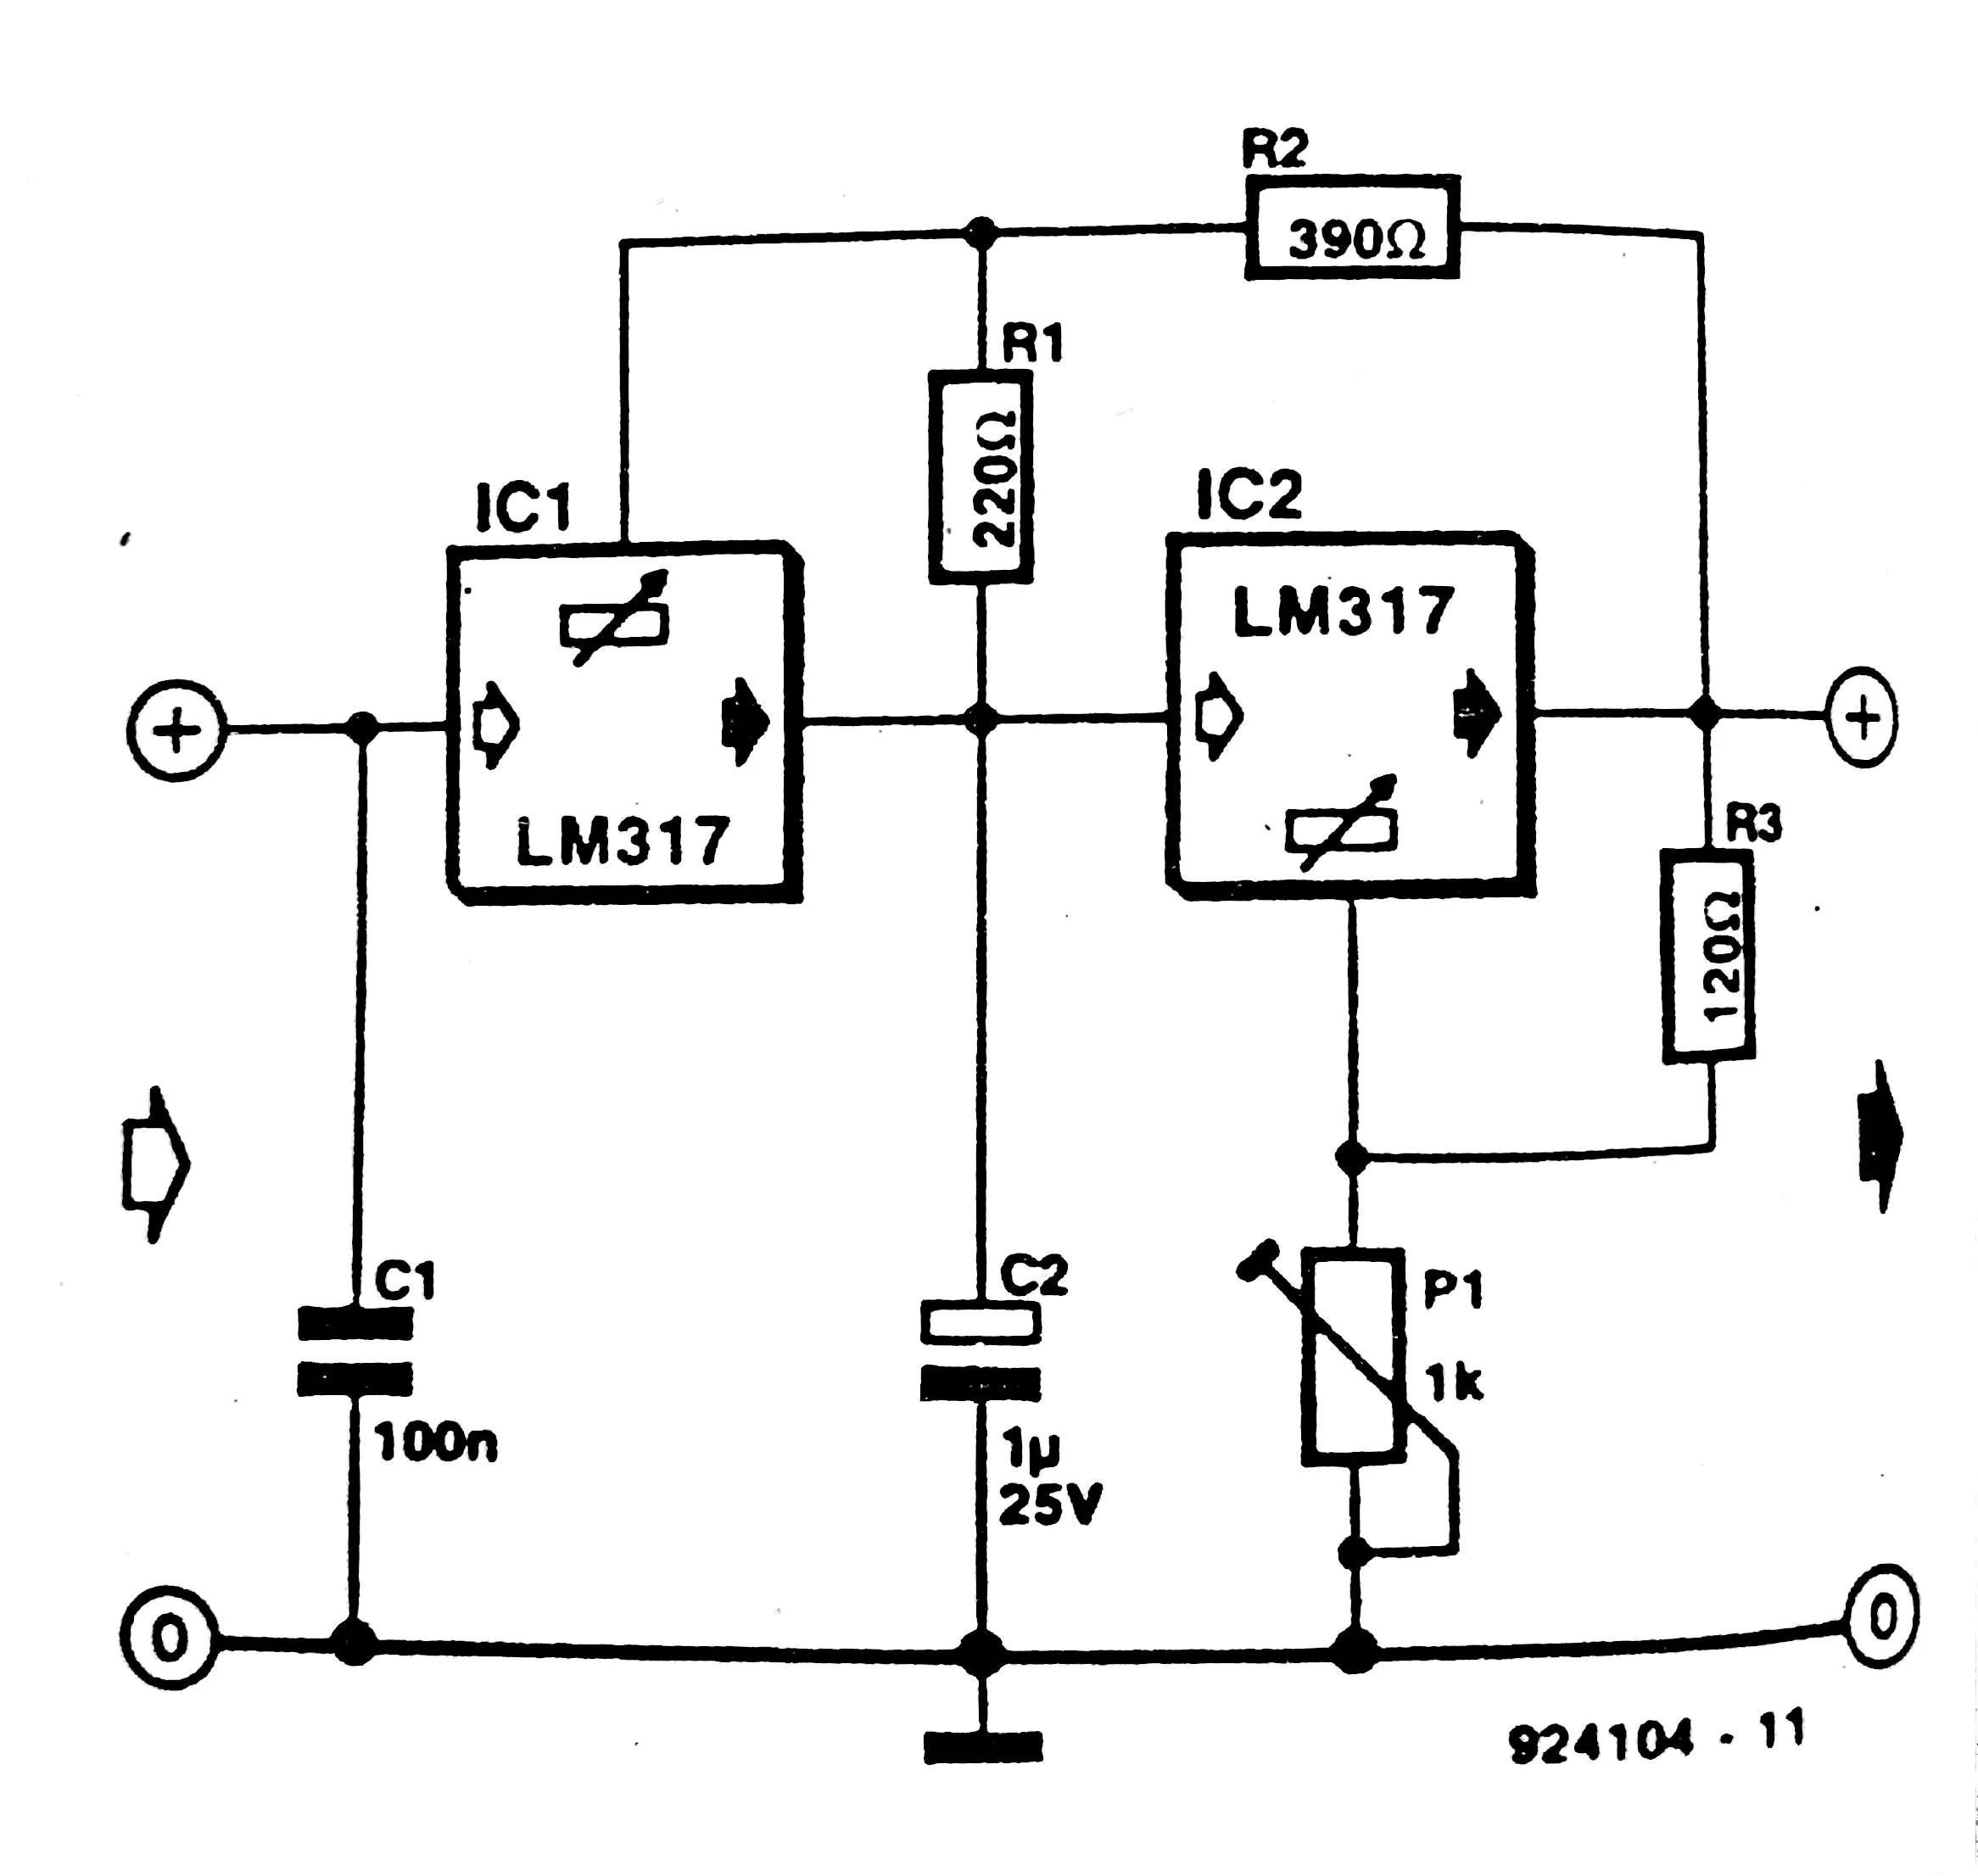 high voltage circuit diagram ribosomes animal cell lm317 regulator